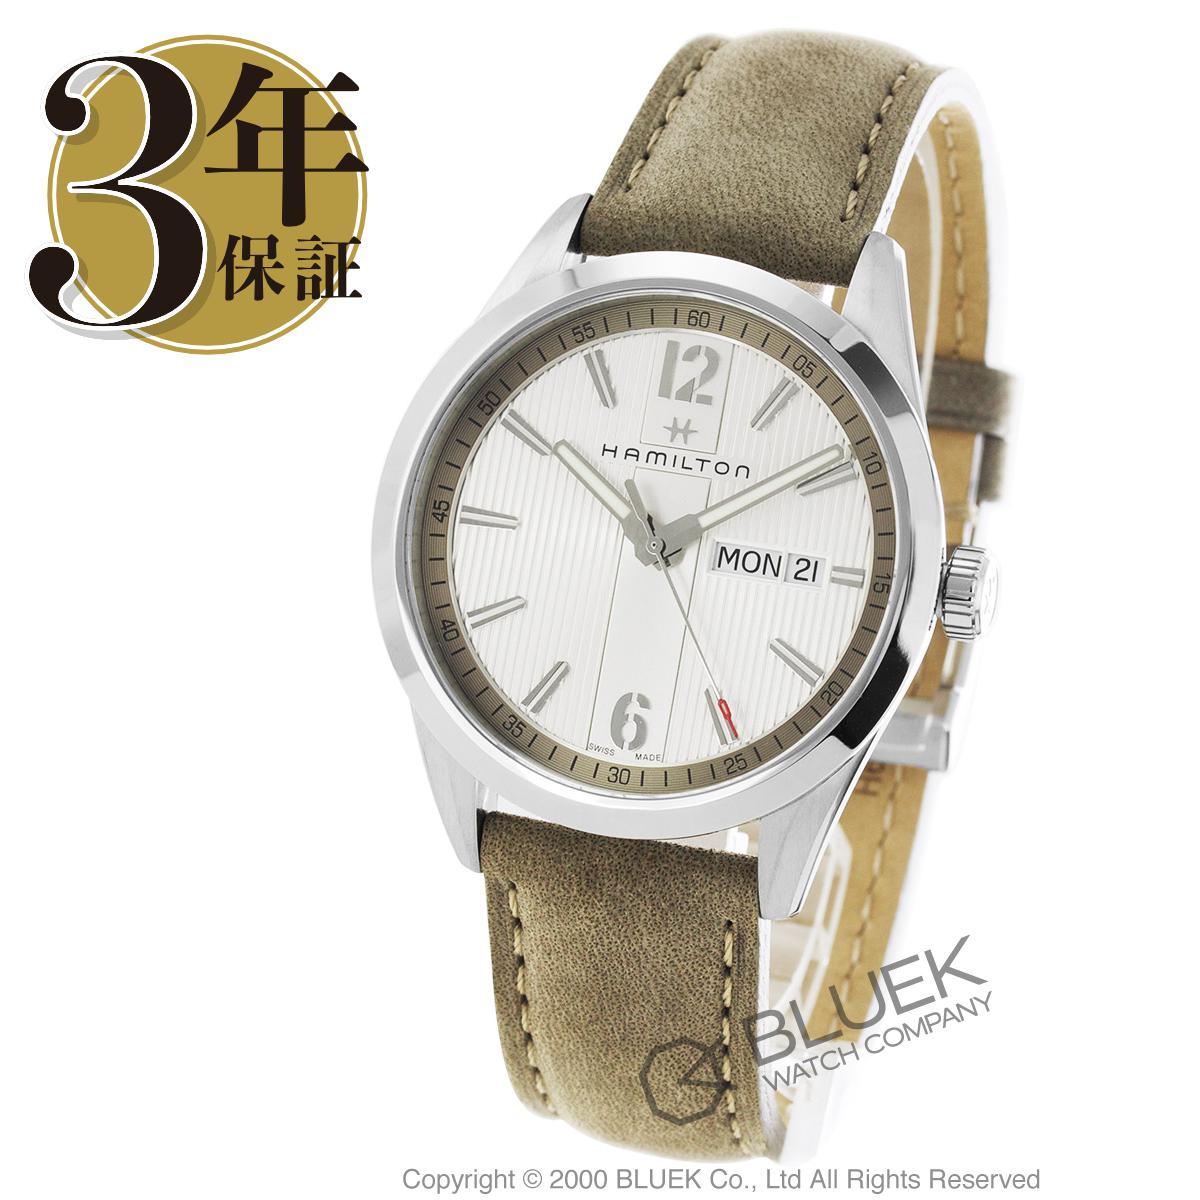 cf227ccde56b ハミルトンブロードウェイデイデイト腕時計メンズHAMILTONH43311915 ...